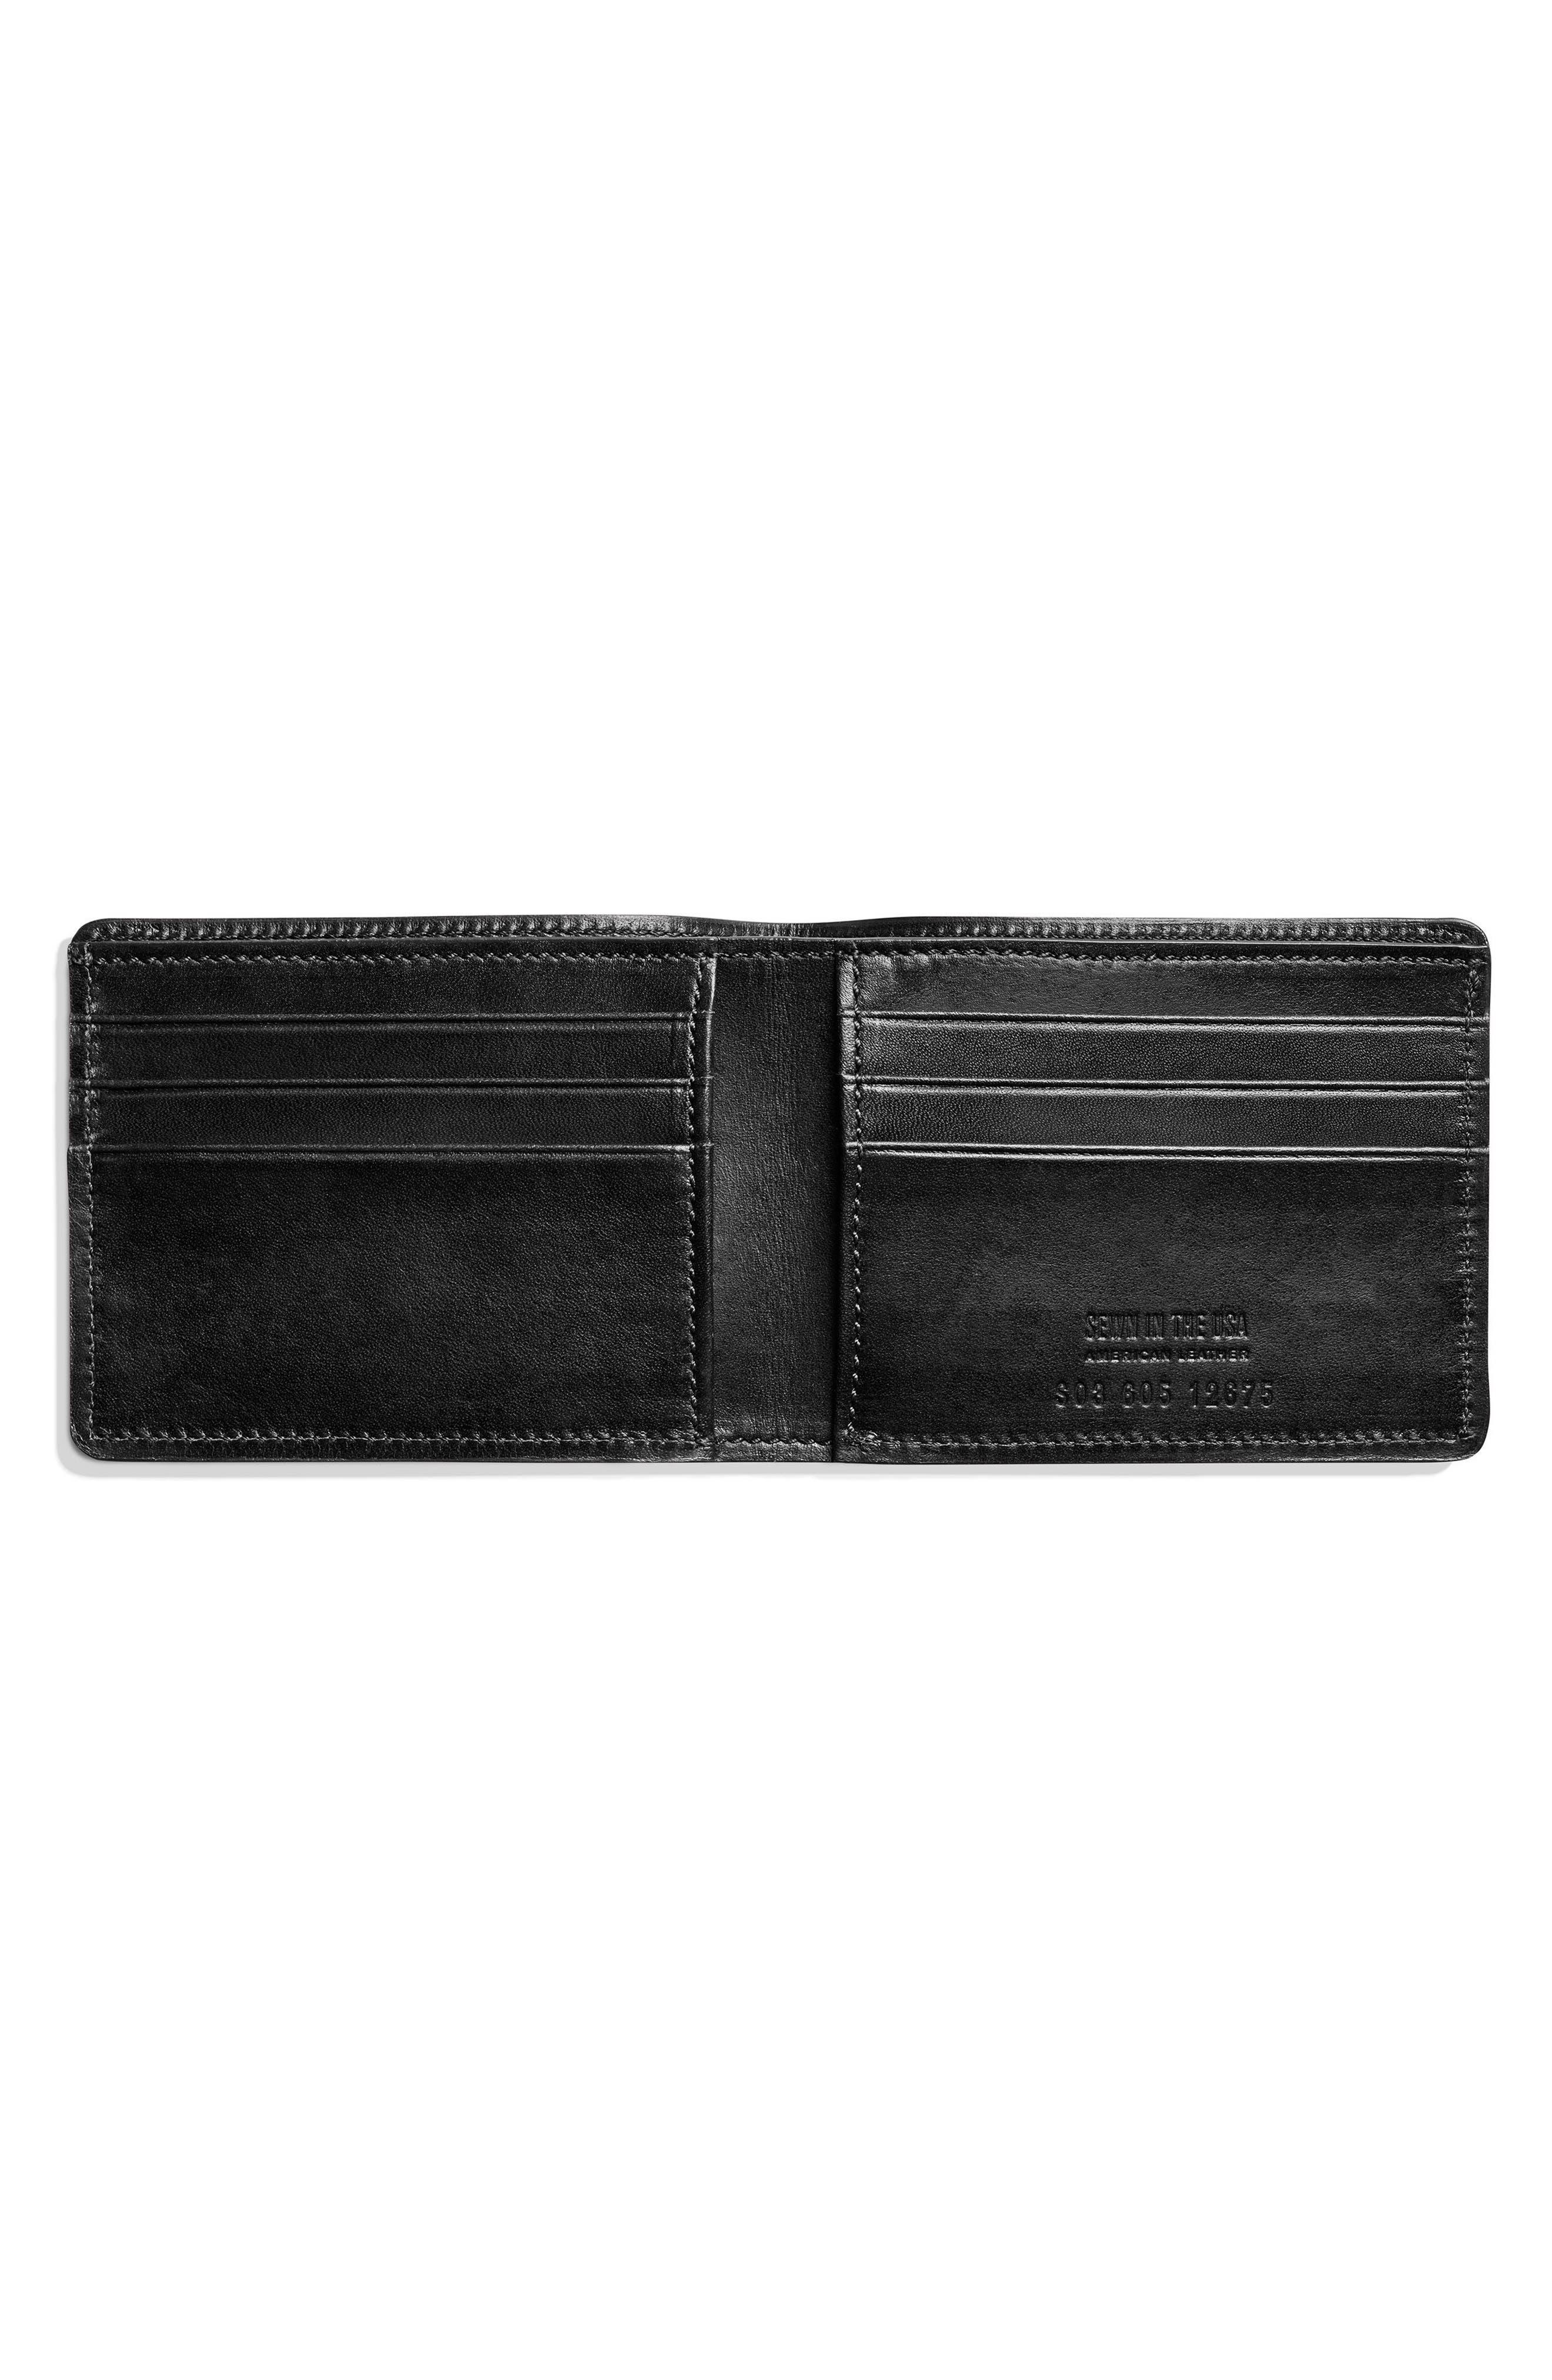 Slim Bifold 2.0 Leather Wallet,                             Alternate thumbnail 3, color,                             BLACK